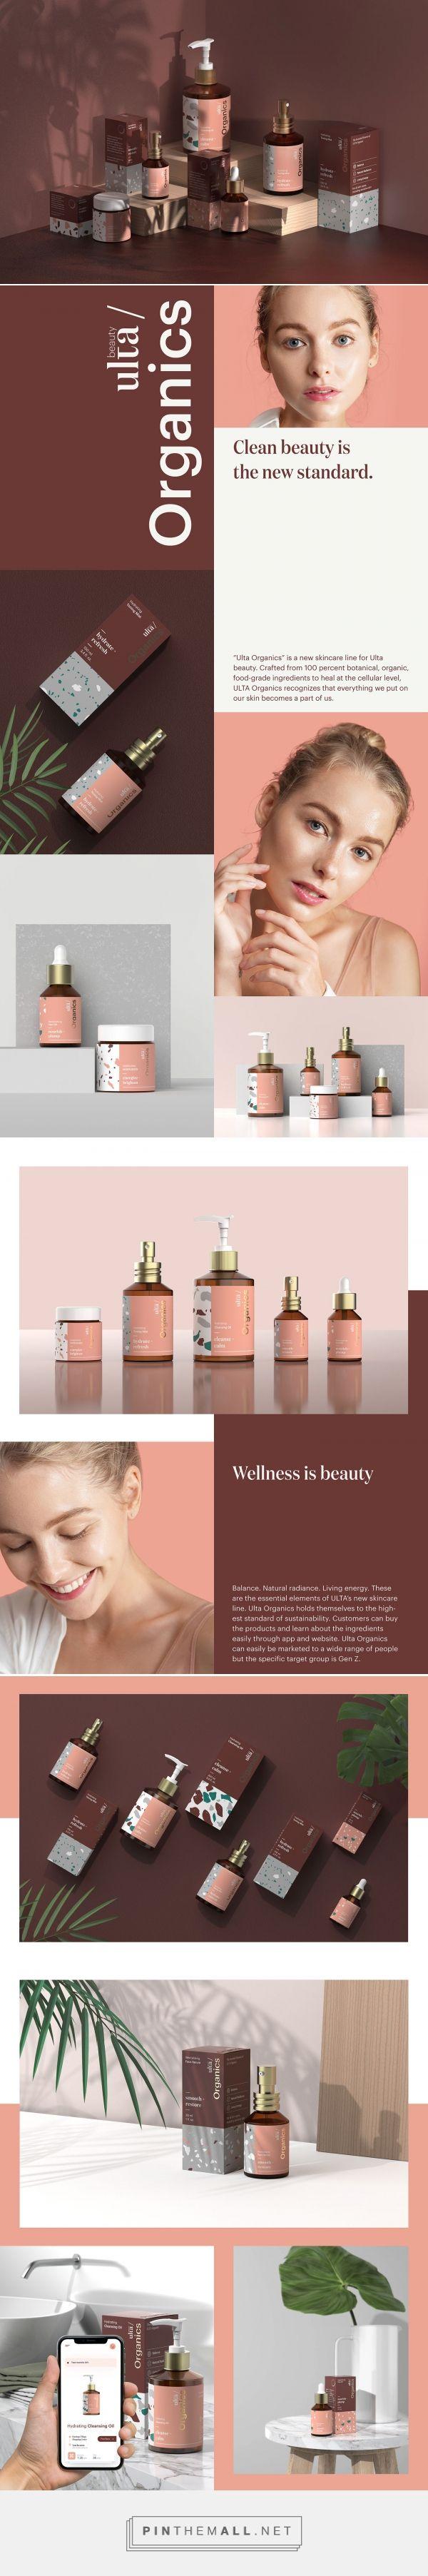 ULTA Organics Skin Care Packaging by Yozei Wu